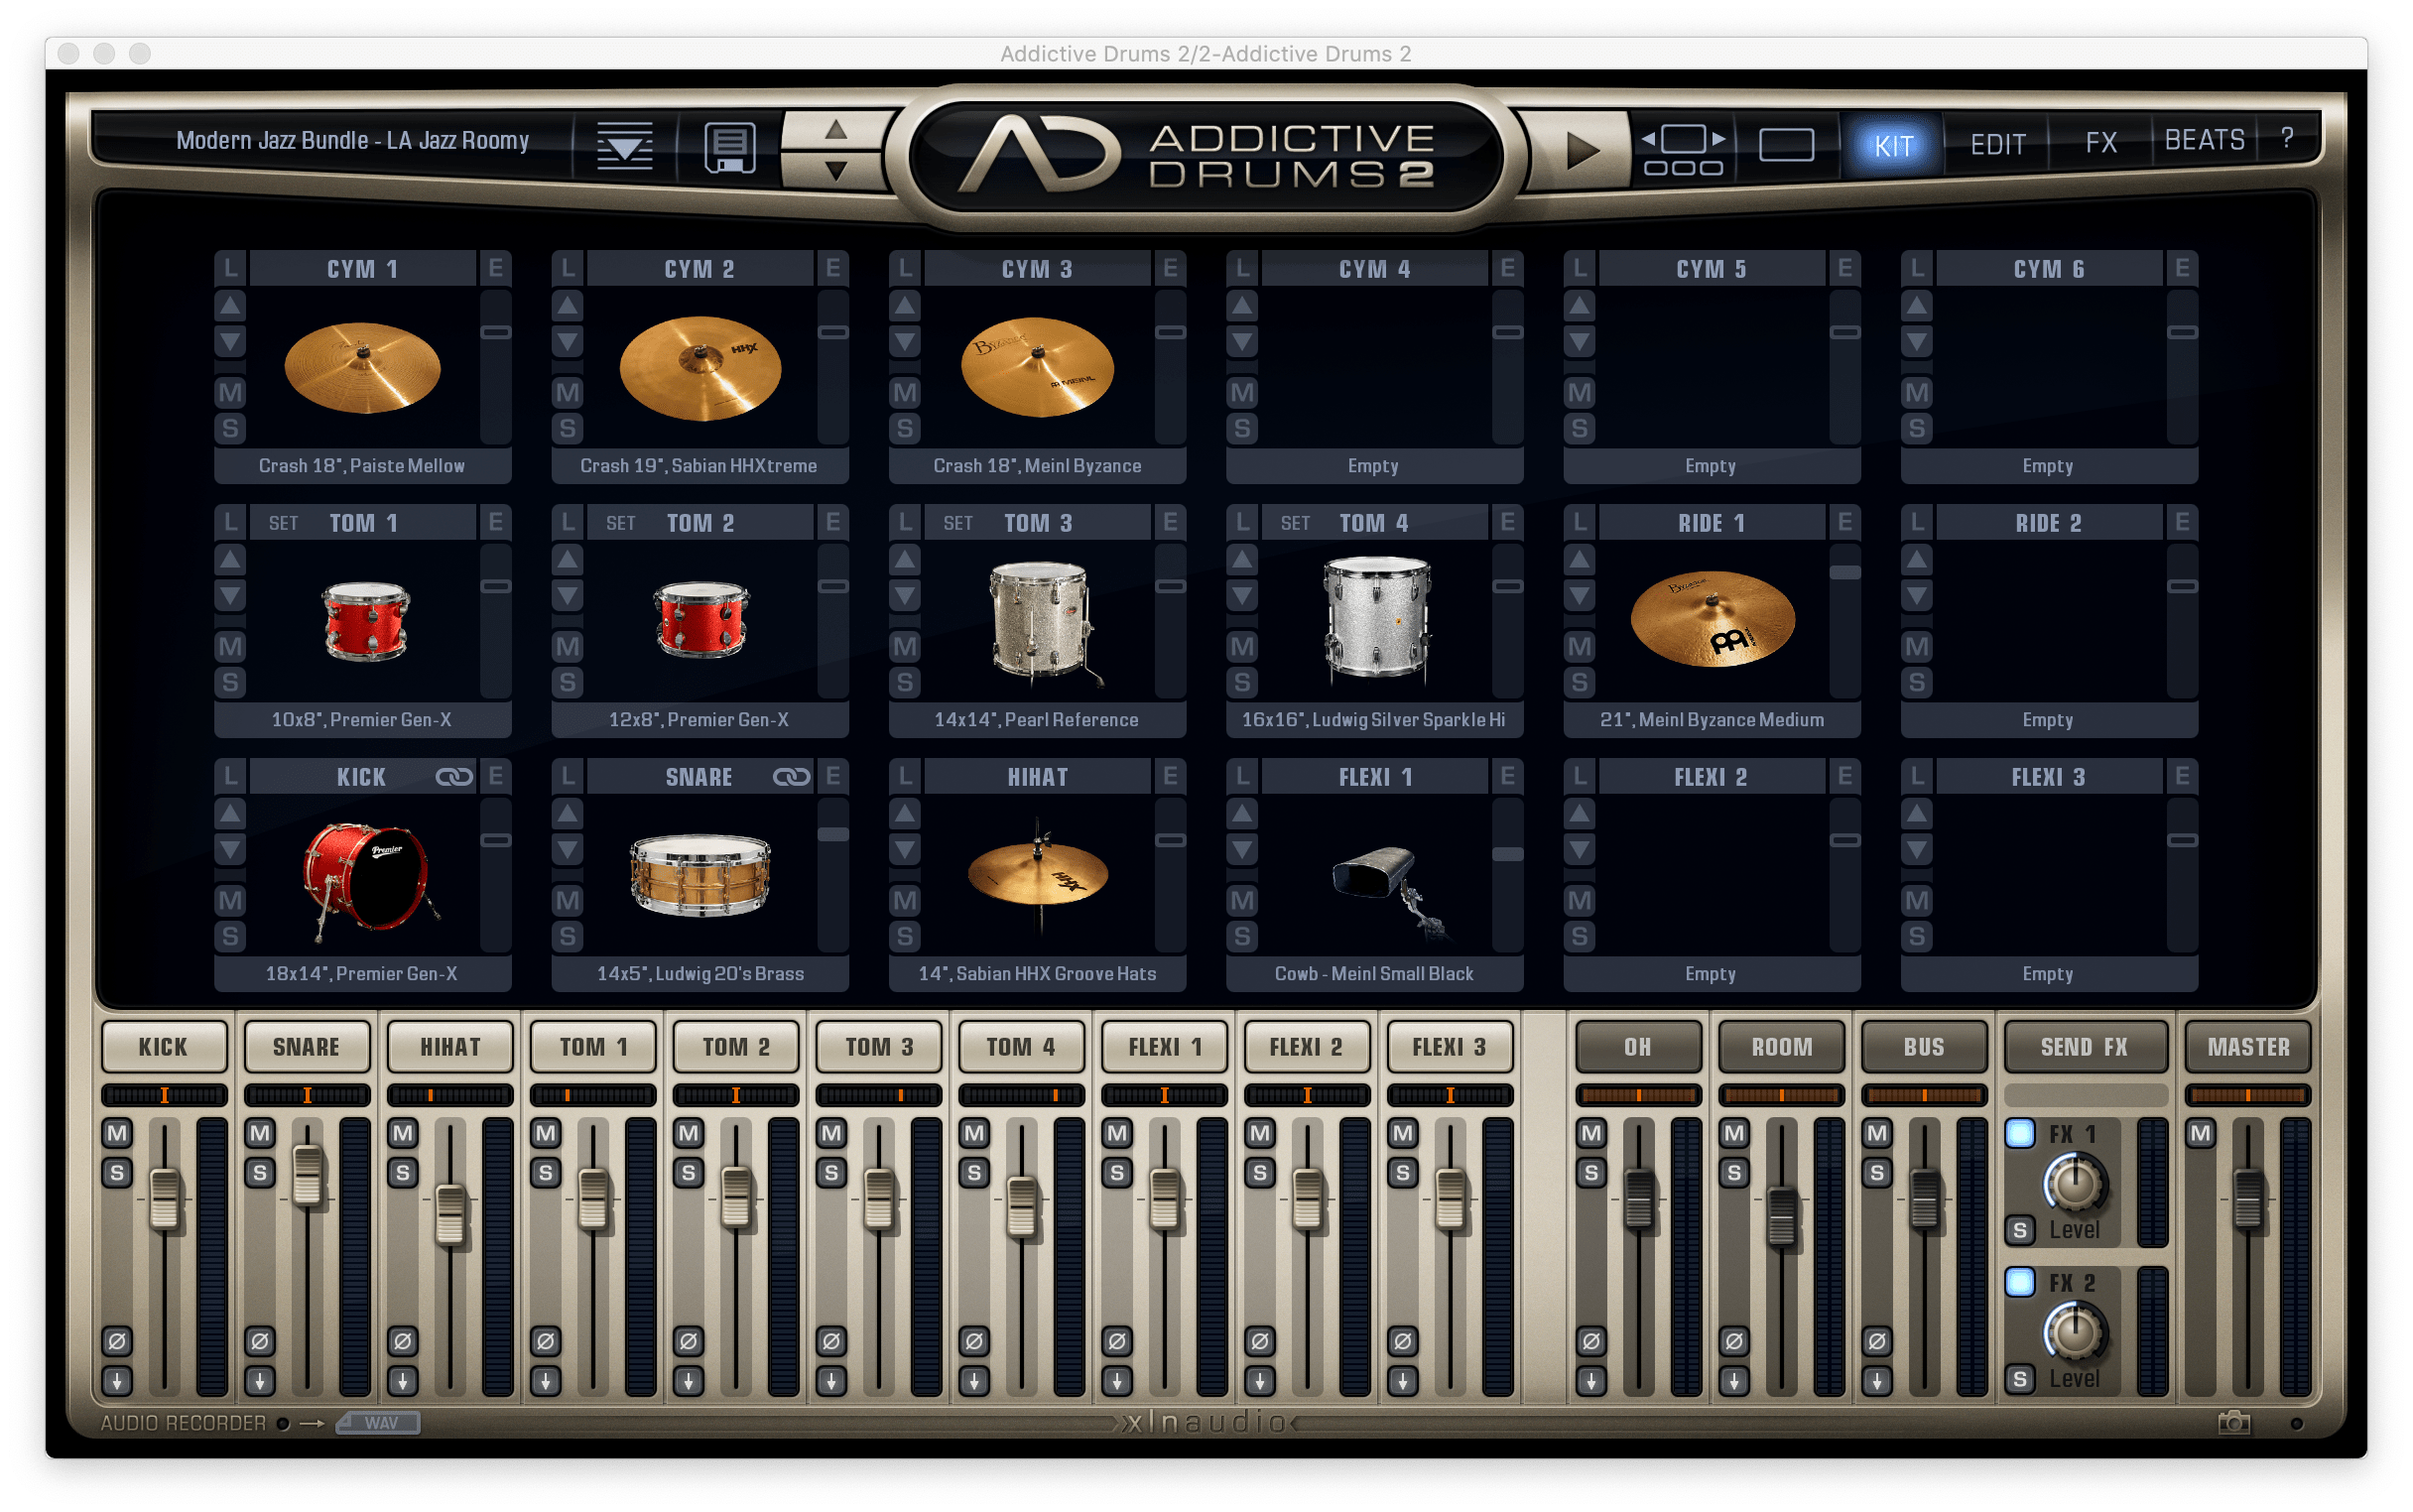 addictive drums 2 badbadnotgood